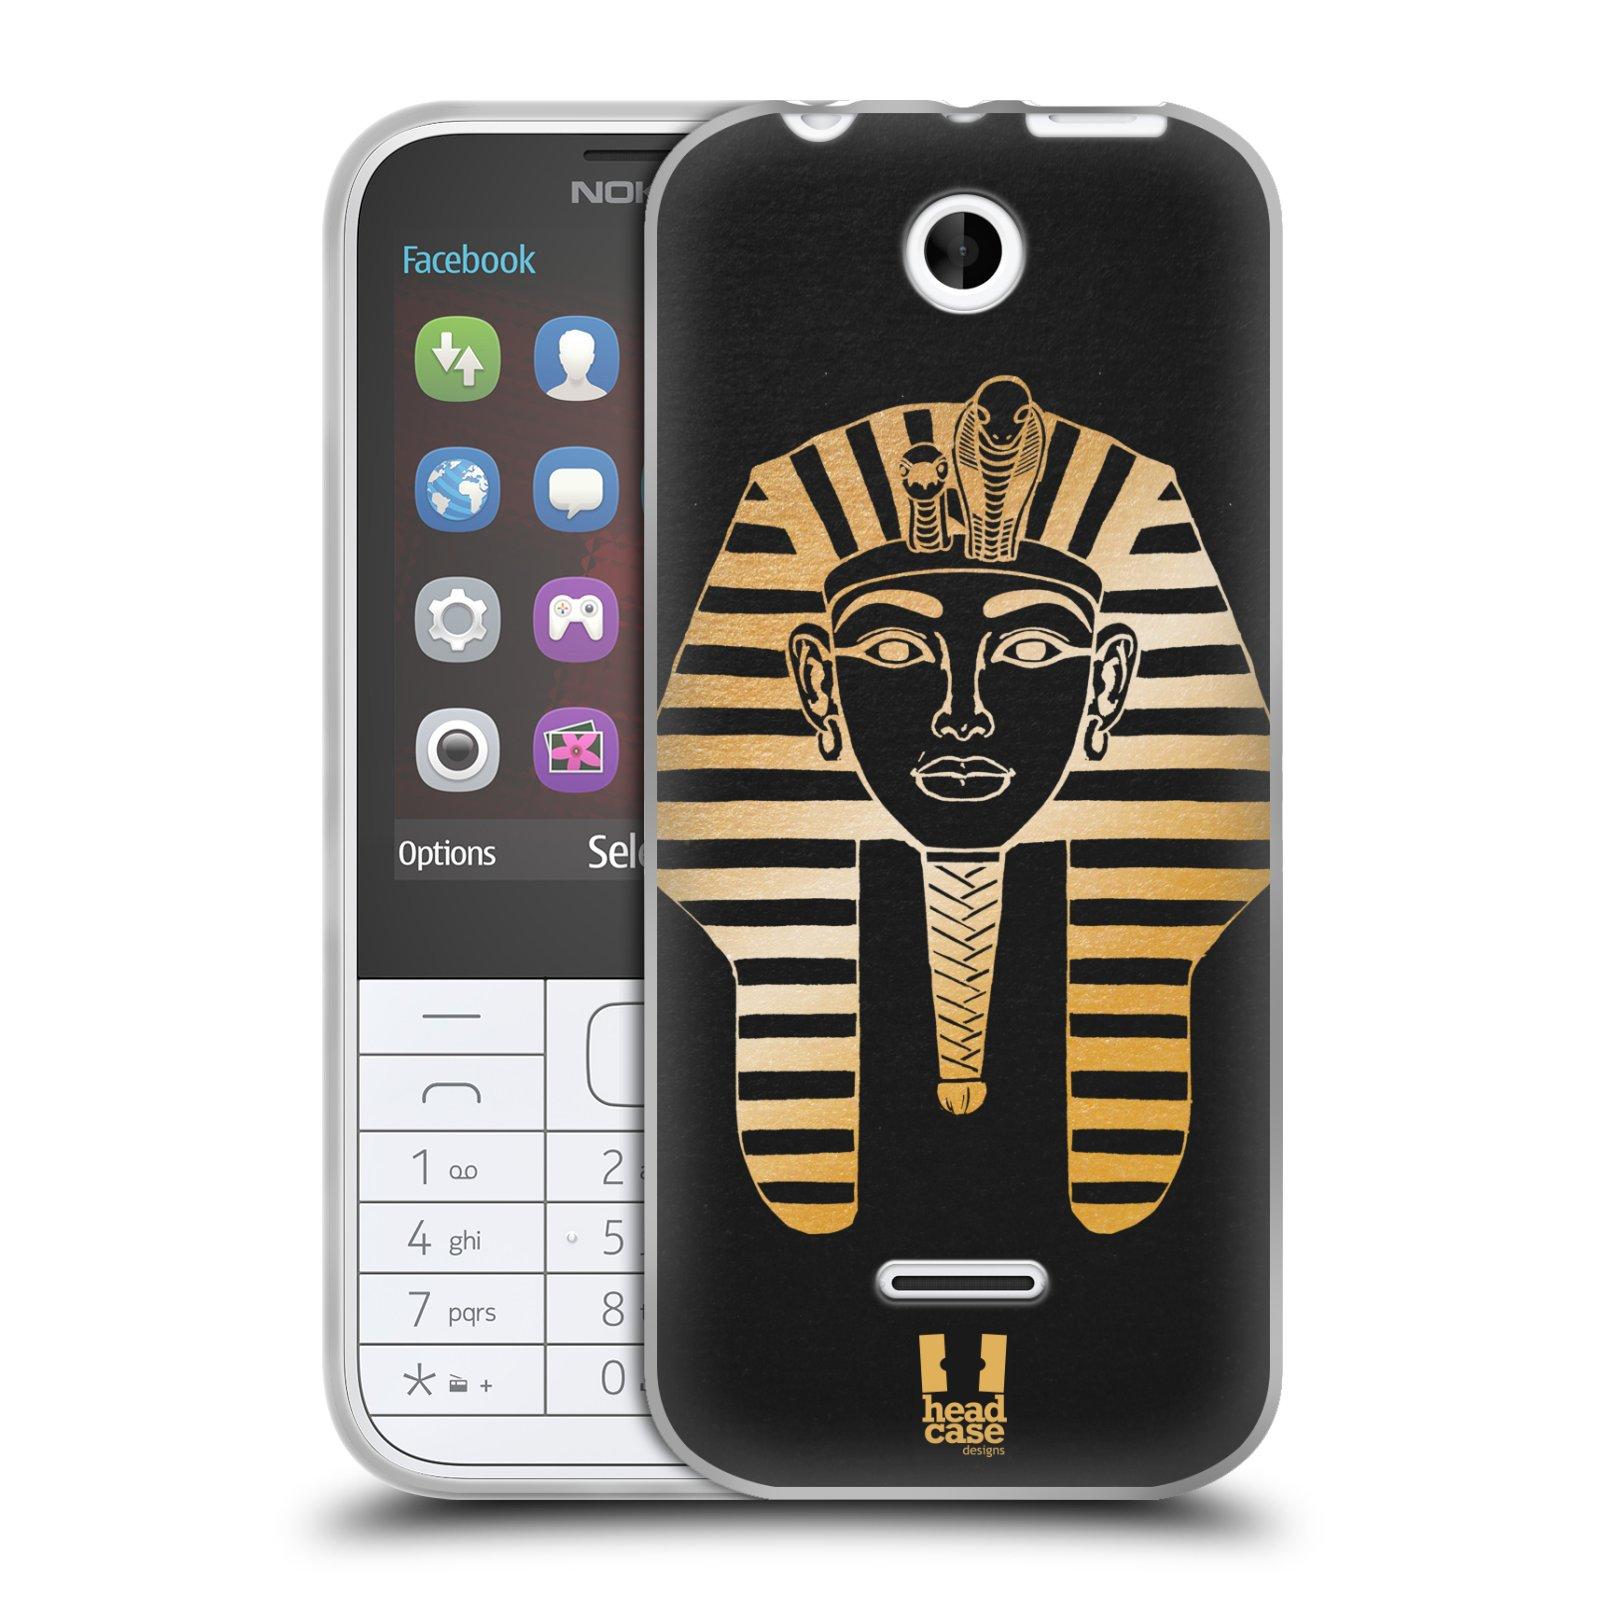 Silikonové pouzdro na mobil Nokia 225 HEAD CASE EGYPT FARAON (Silikonový kryt či obal na mobilní telefon Nokia 225)